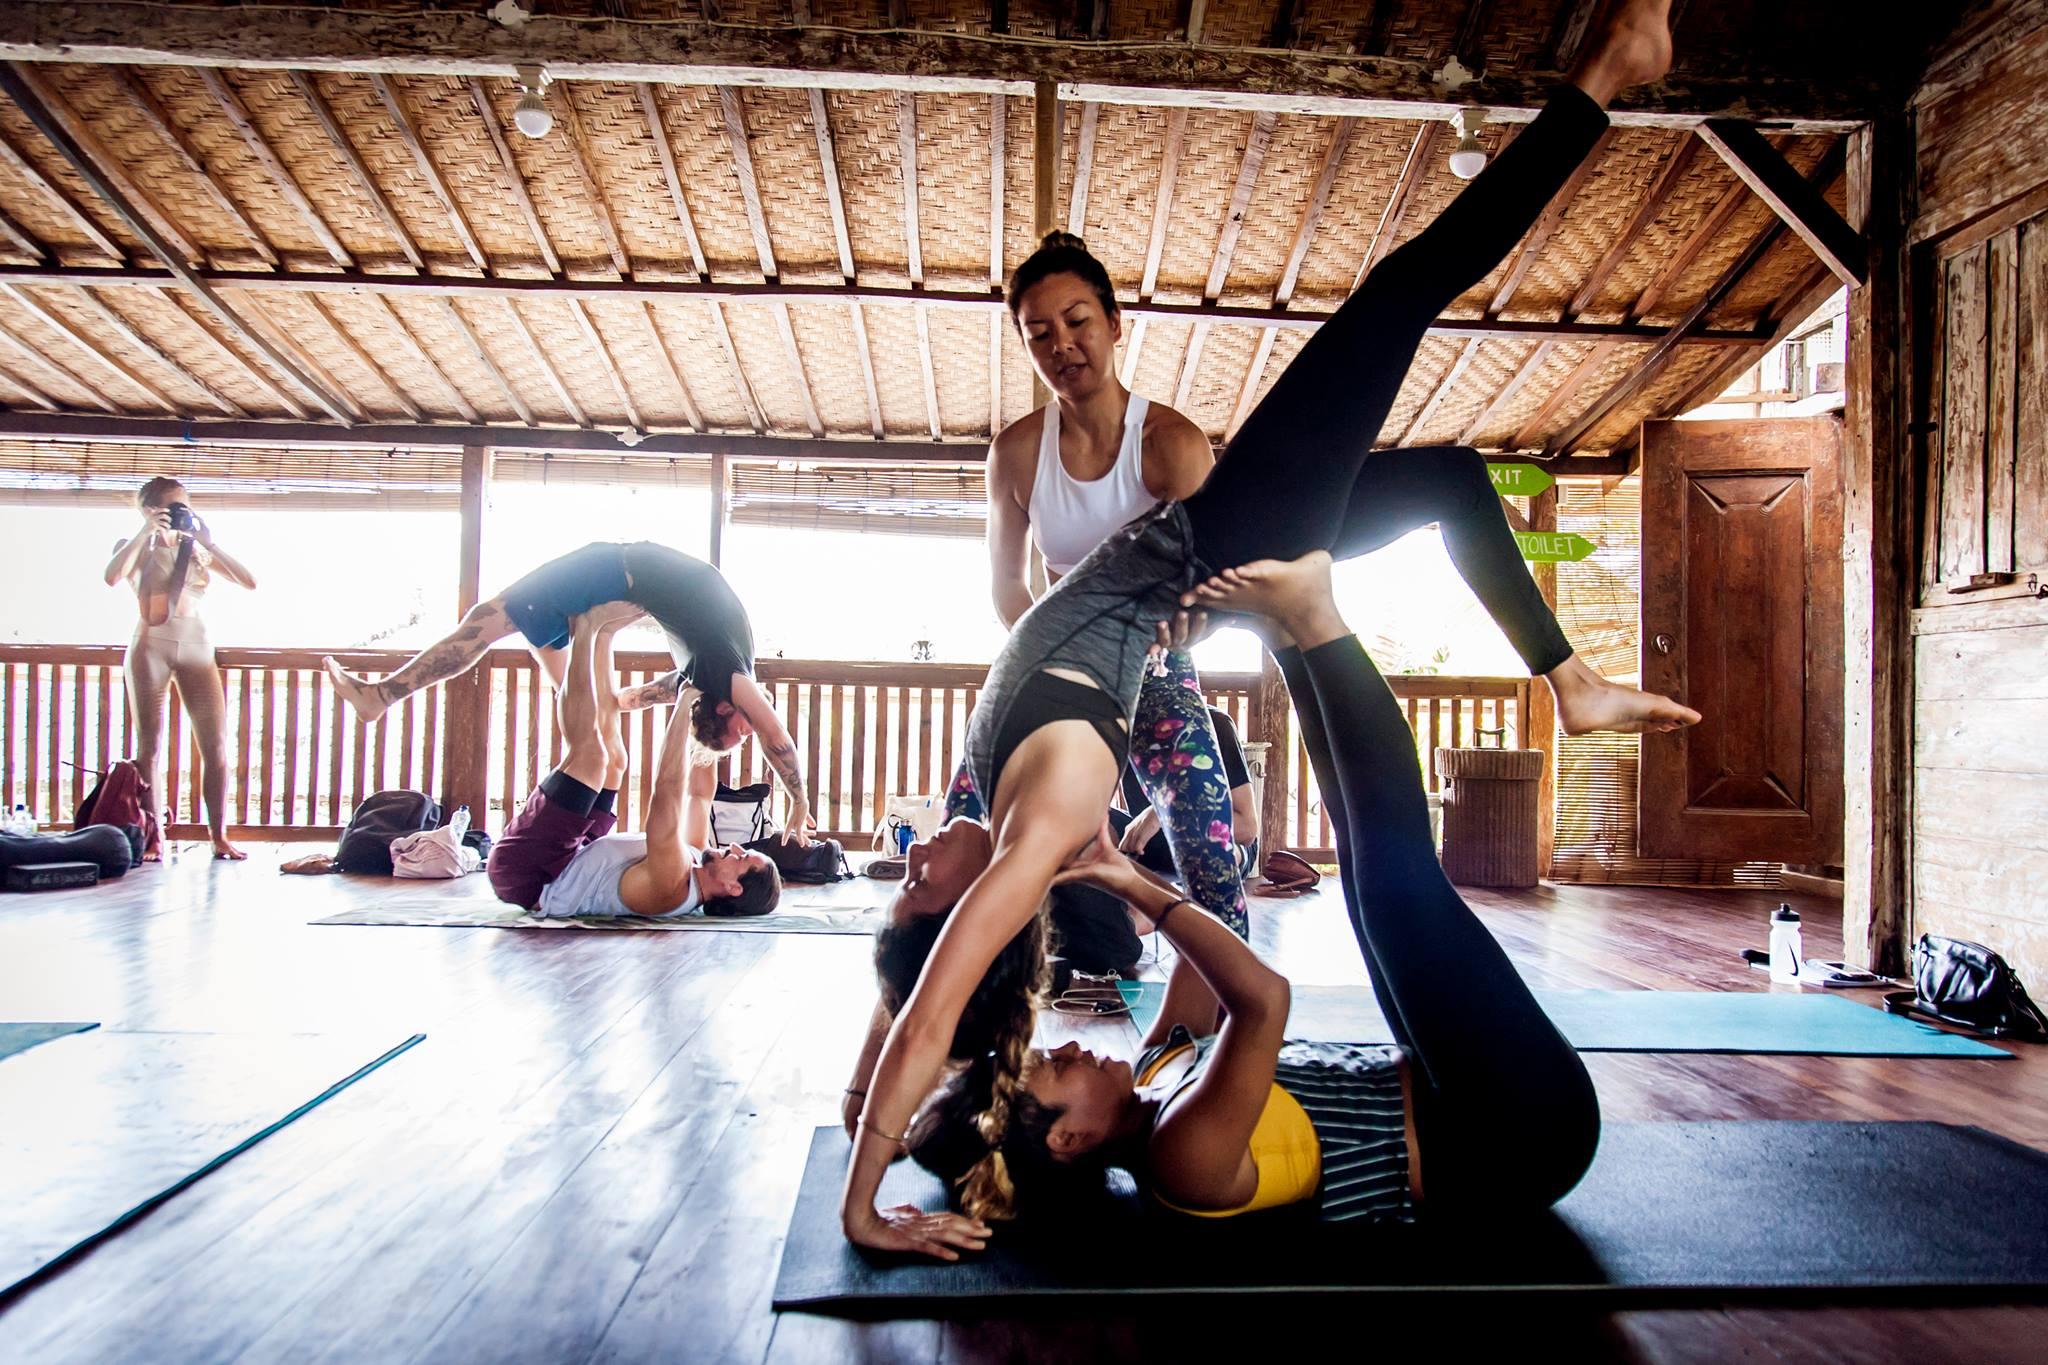 compte rendu de ma formation de 200hrs de yoga a Bali 56